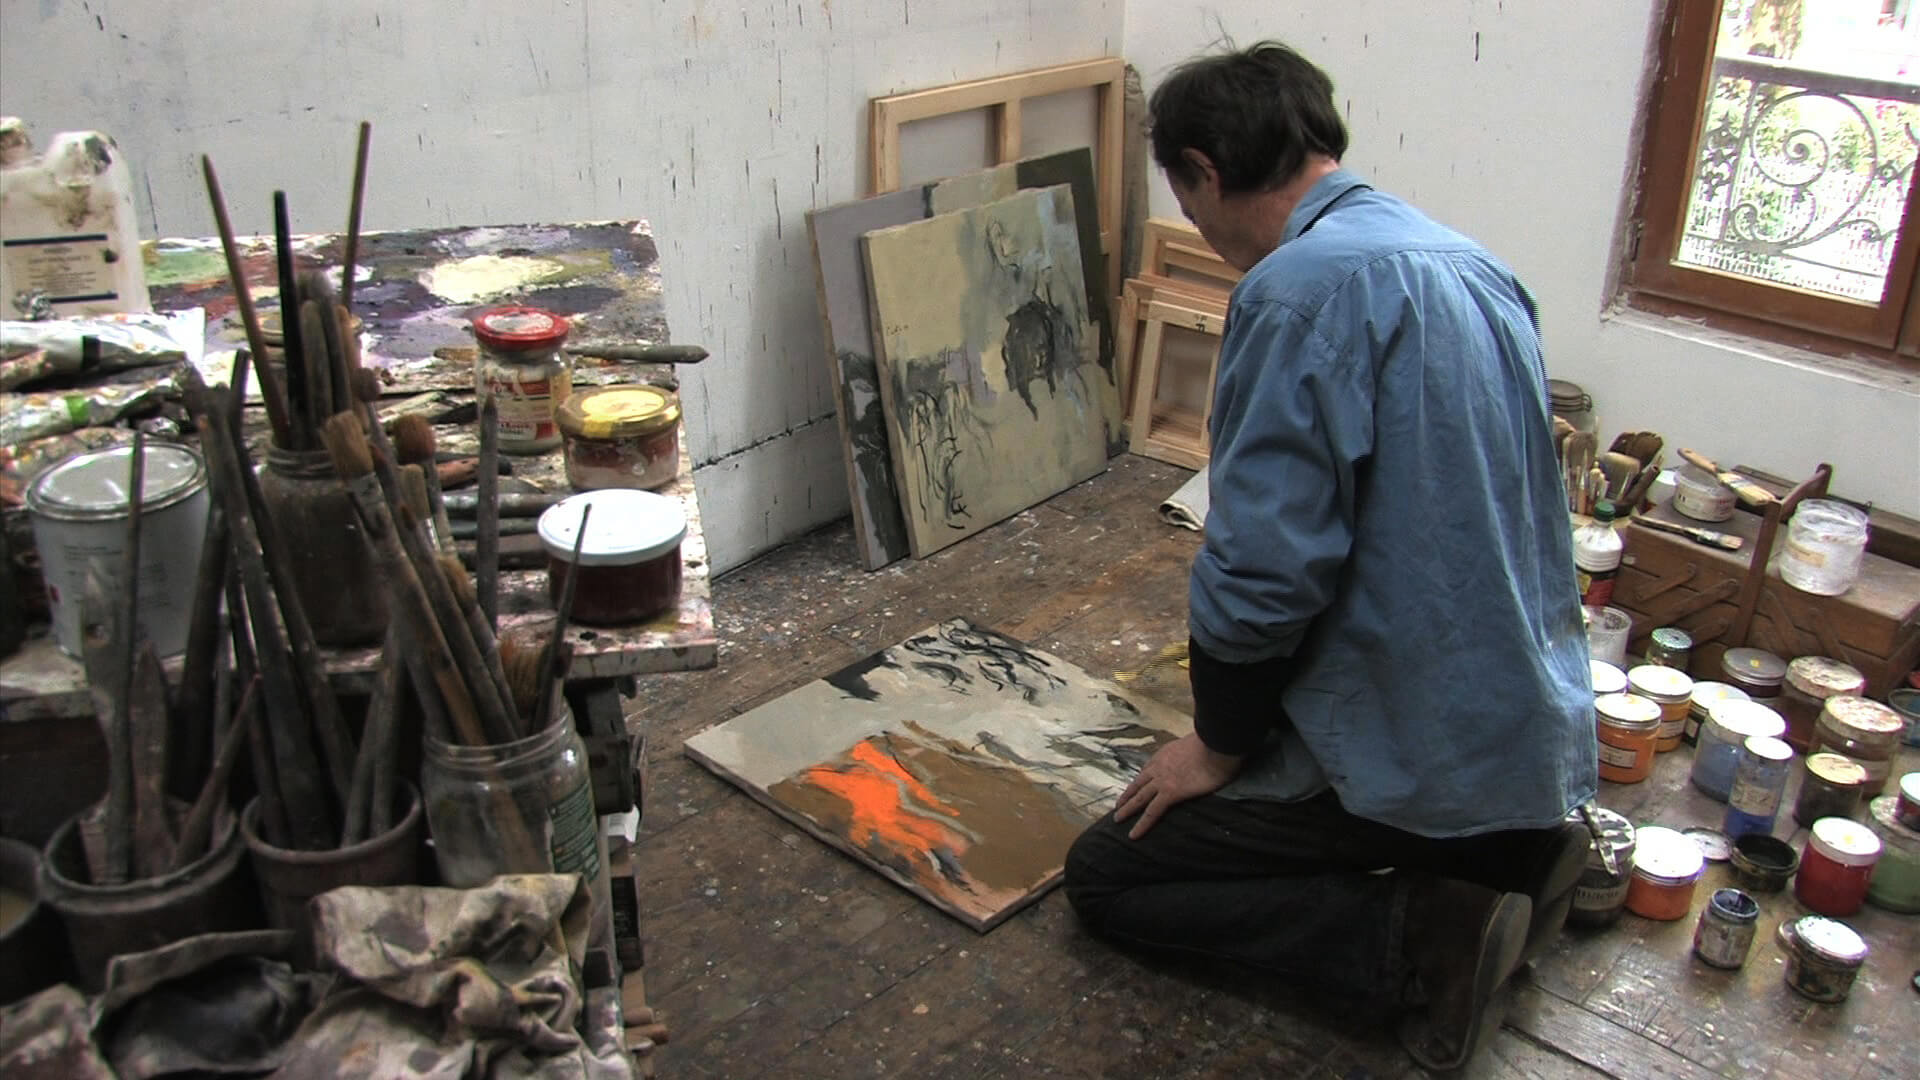 Une histoire de pyramide… Dans l'atelier d'Istvan Péto, de Daniel Kupferstein